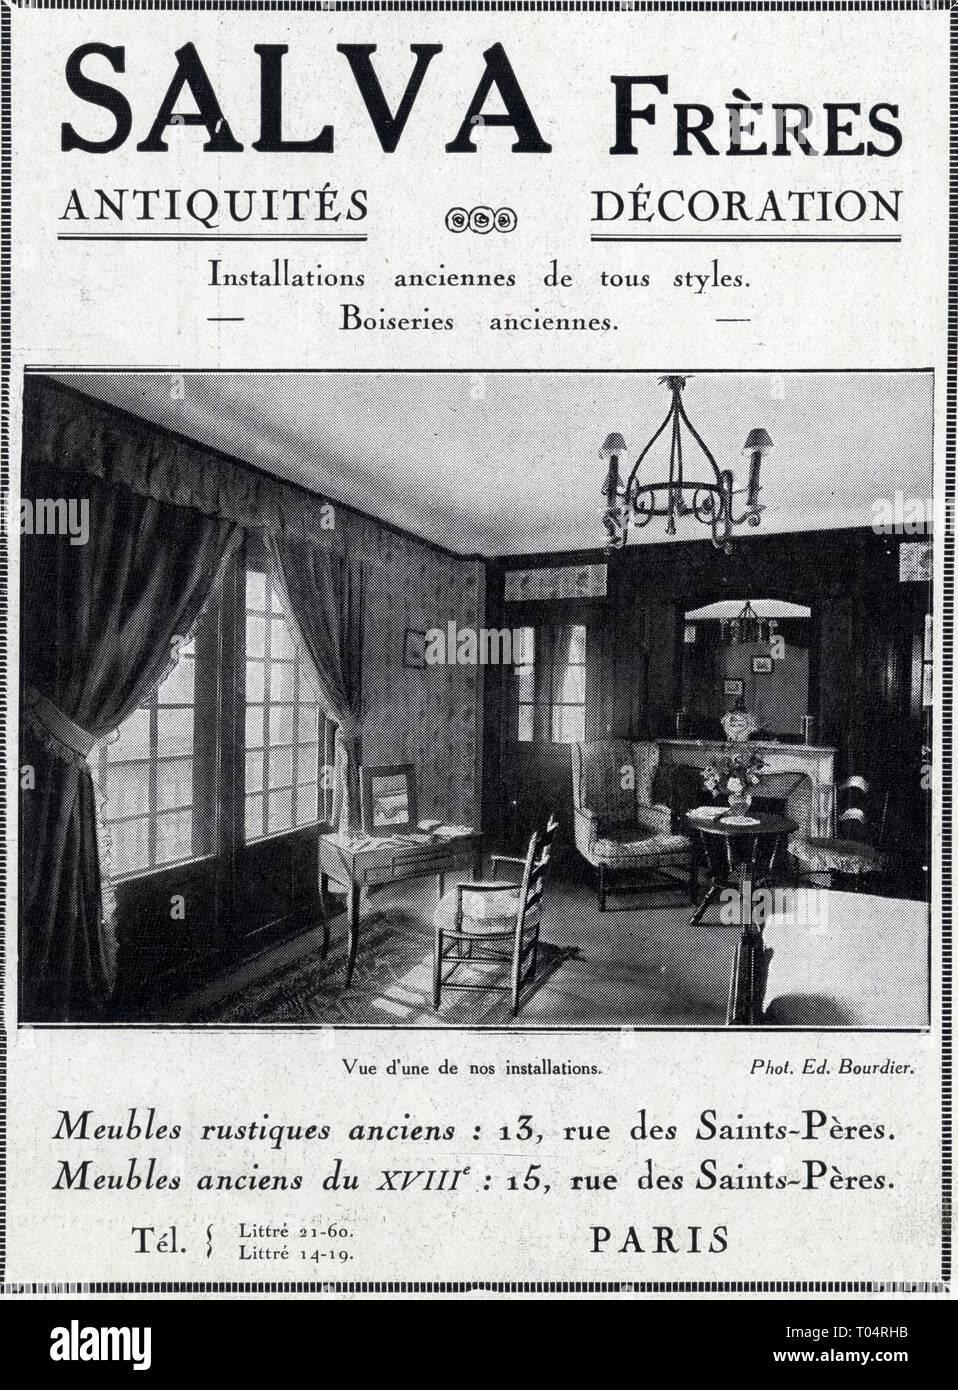 Meuble Ancien Style Henri 4 meuble stock photos & meuble stock images - page 2 - alamy